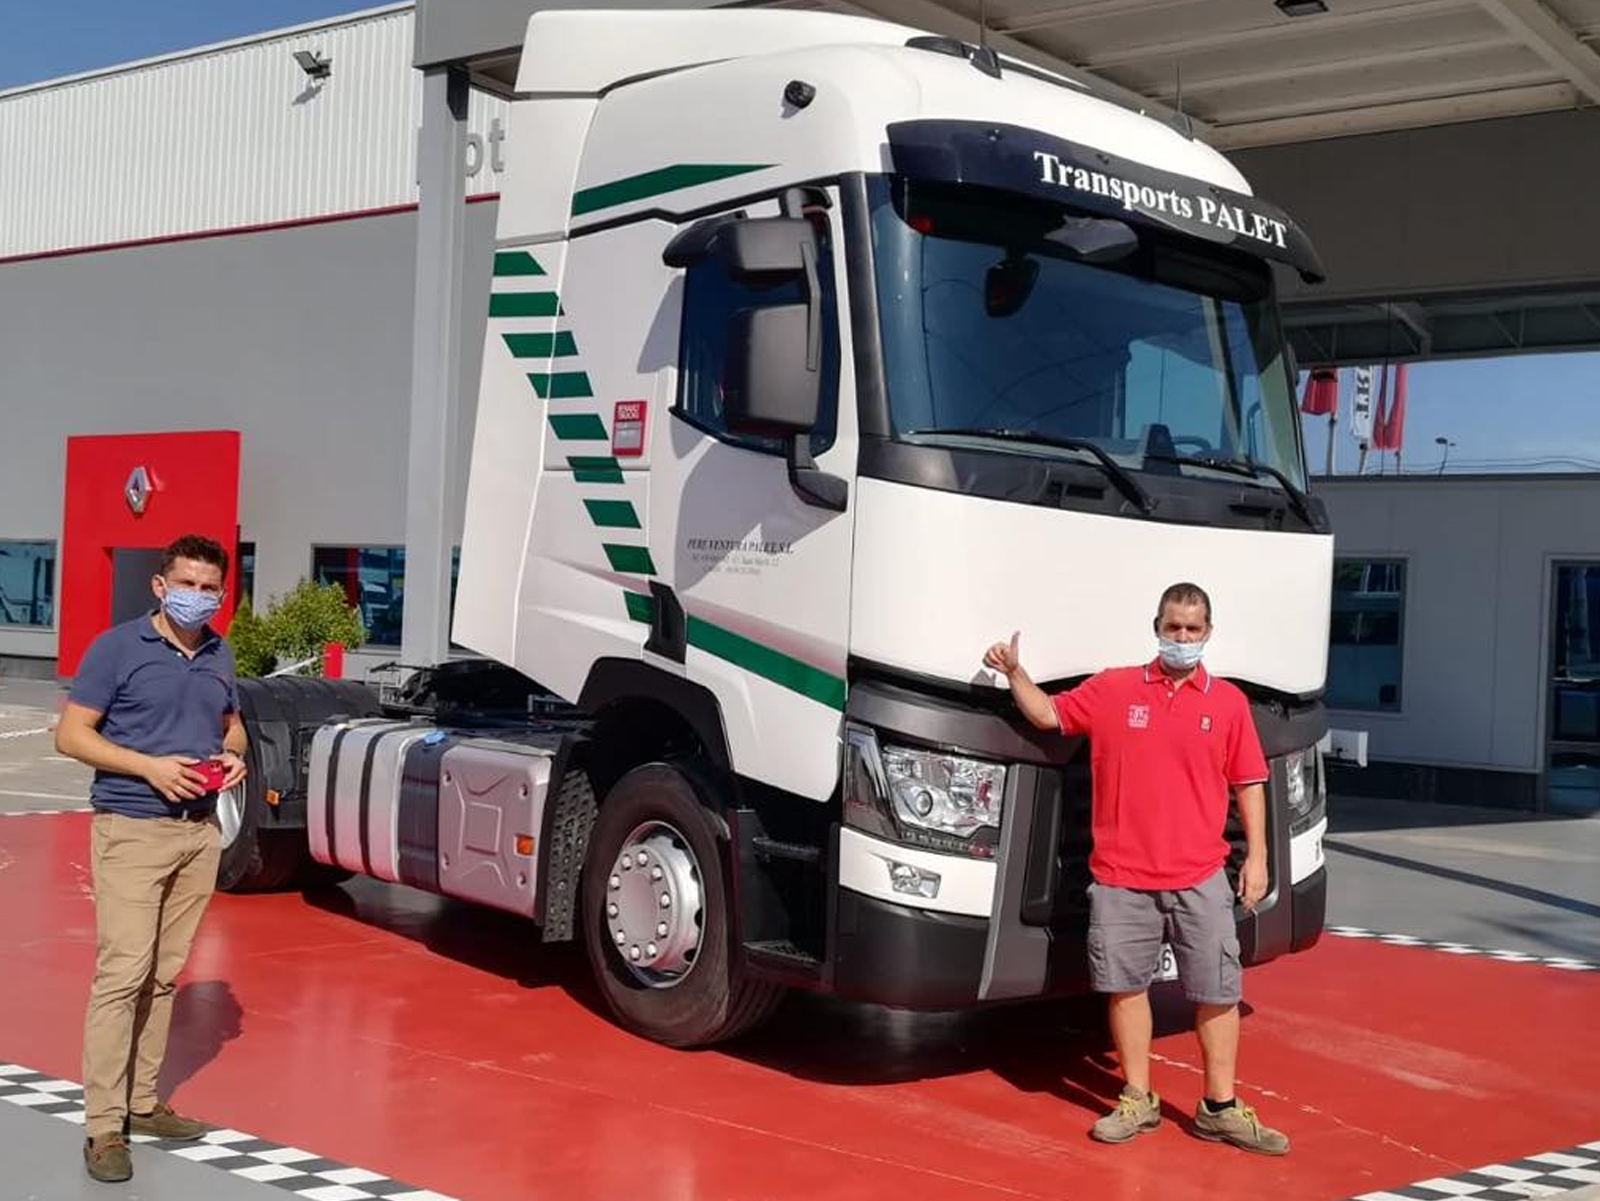 Entrega de vehículo a Renault Trucks T 460 a Transpórtes Palet